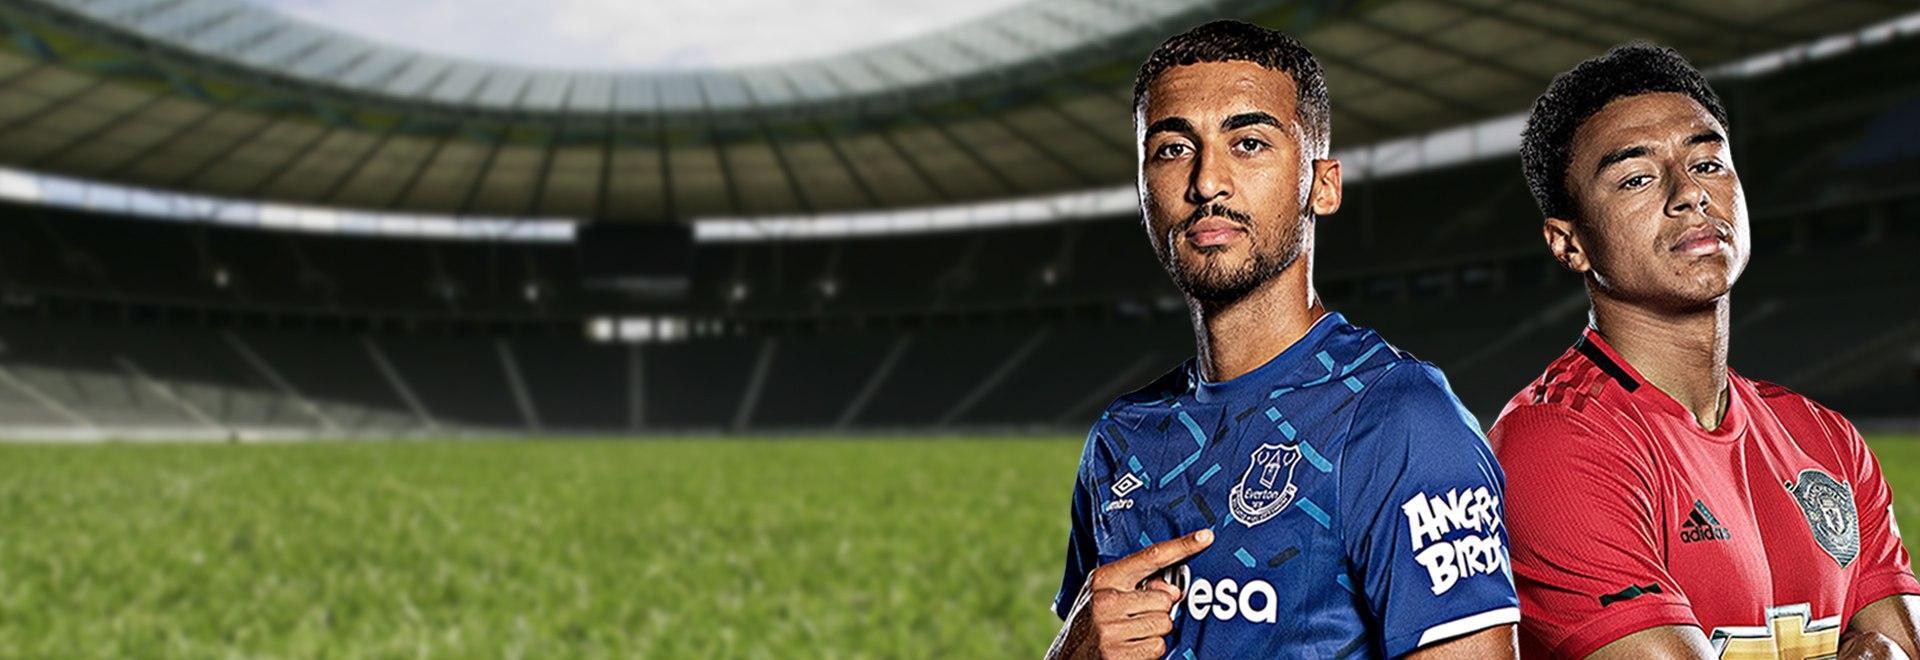 Everton - Man Utd. 28a g.